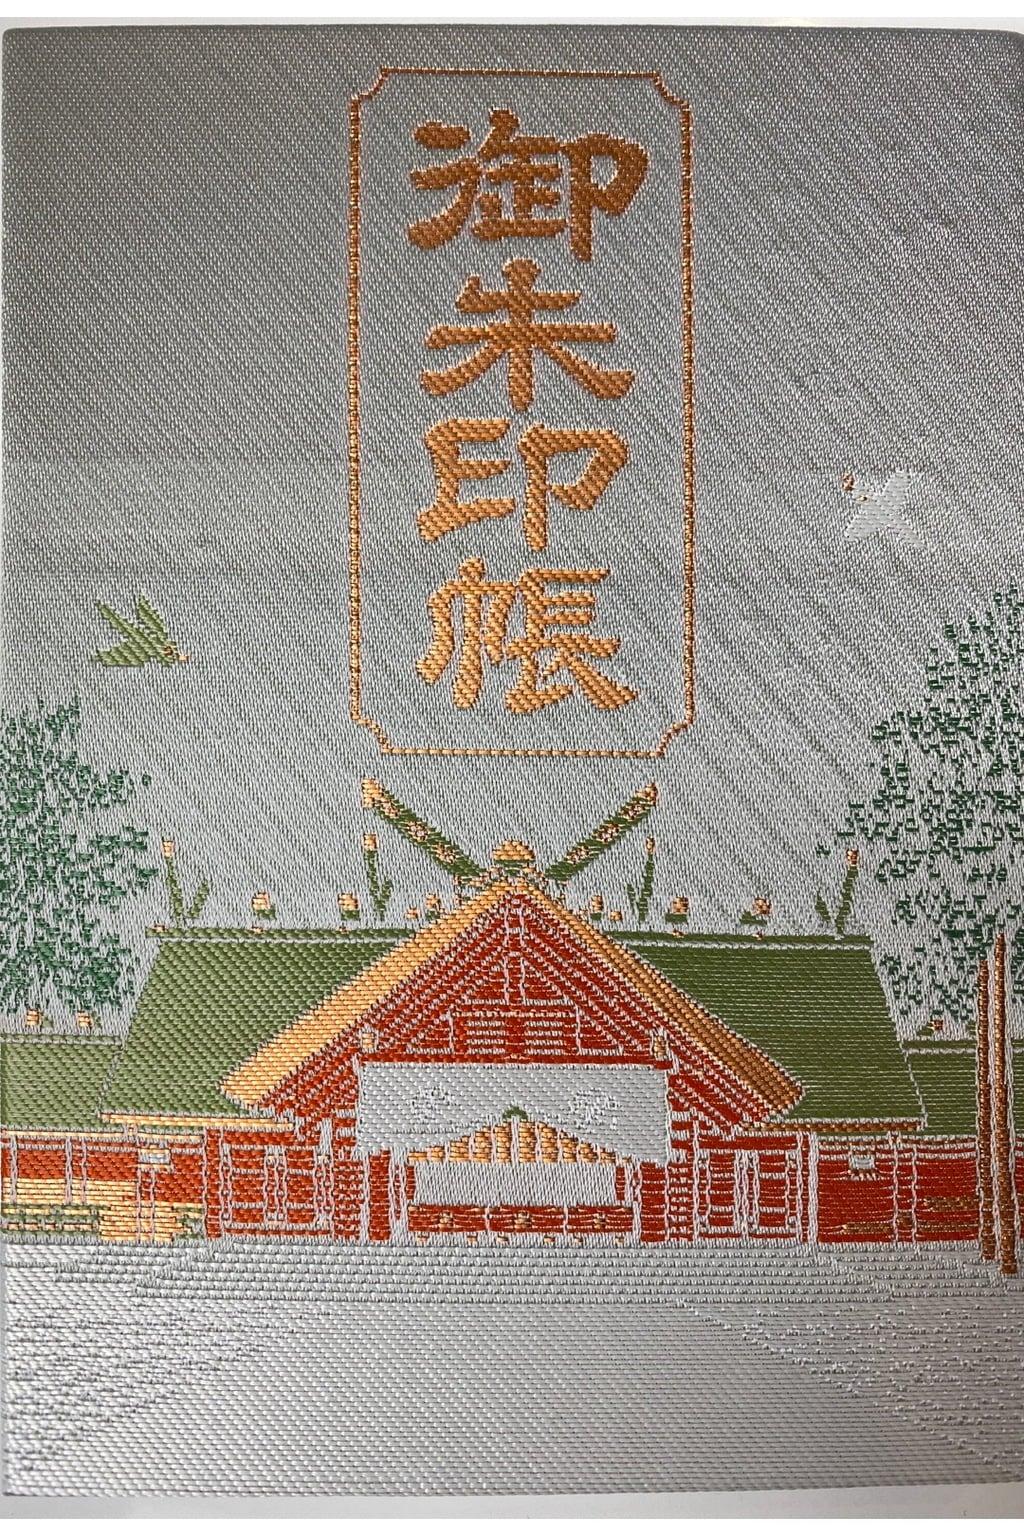 北海道神宮の御朱印帳